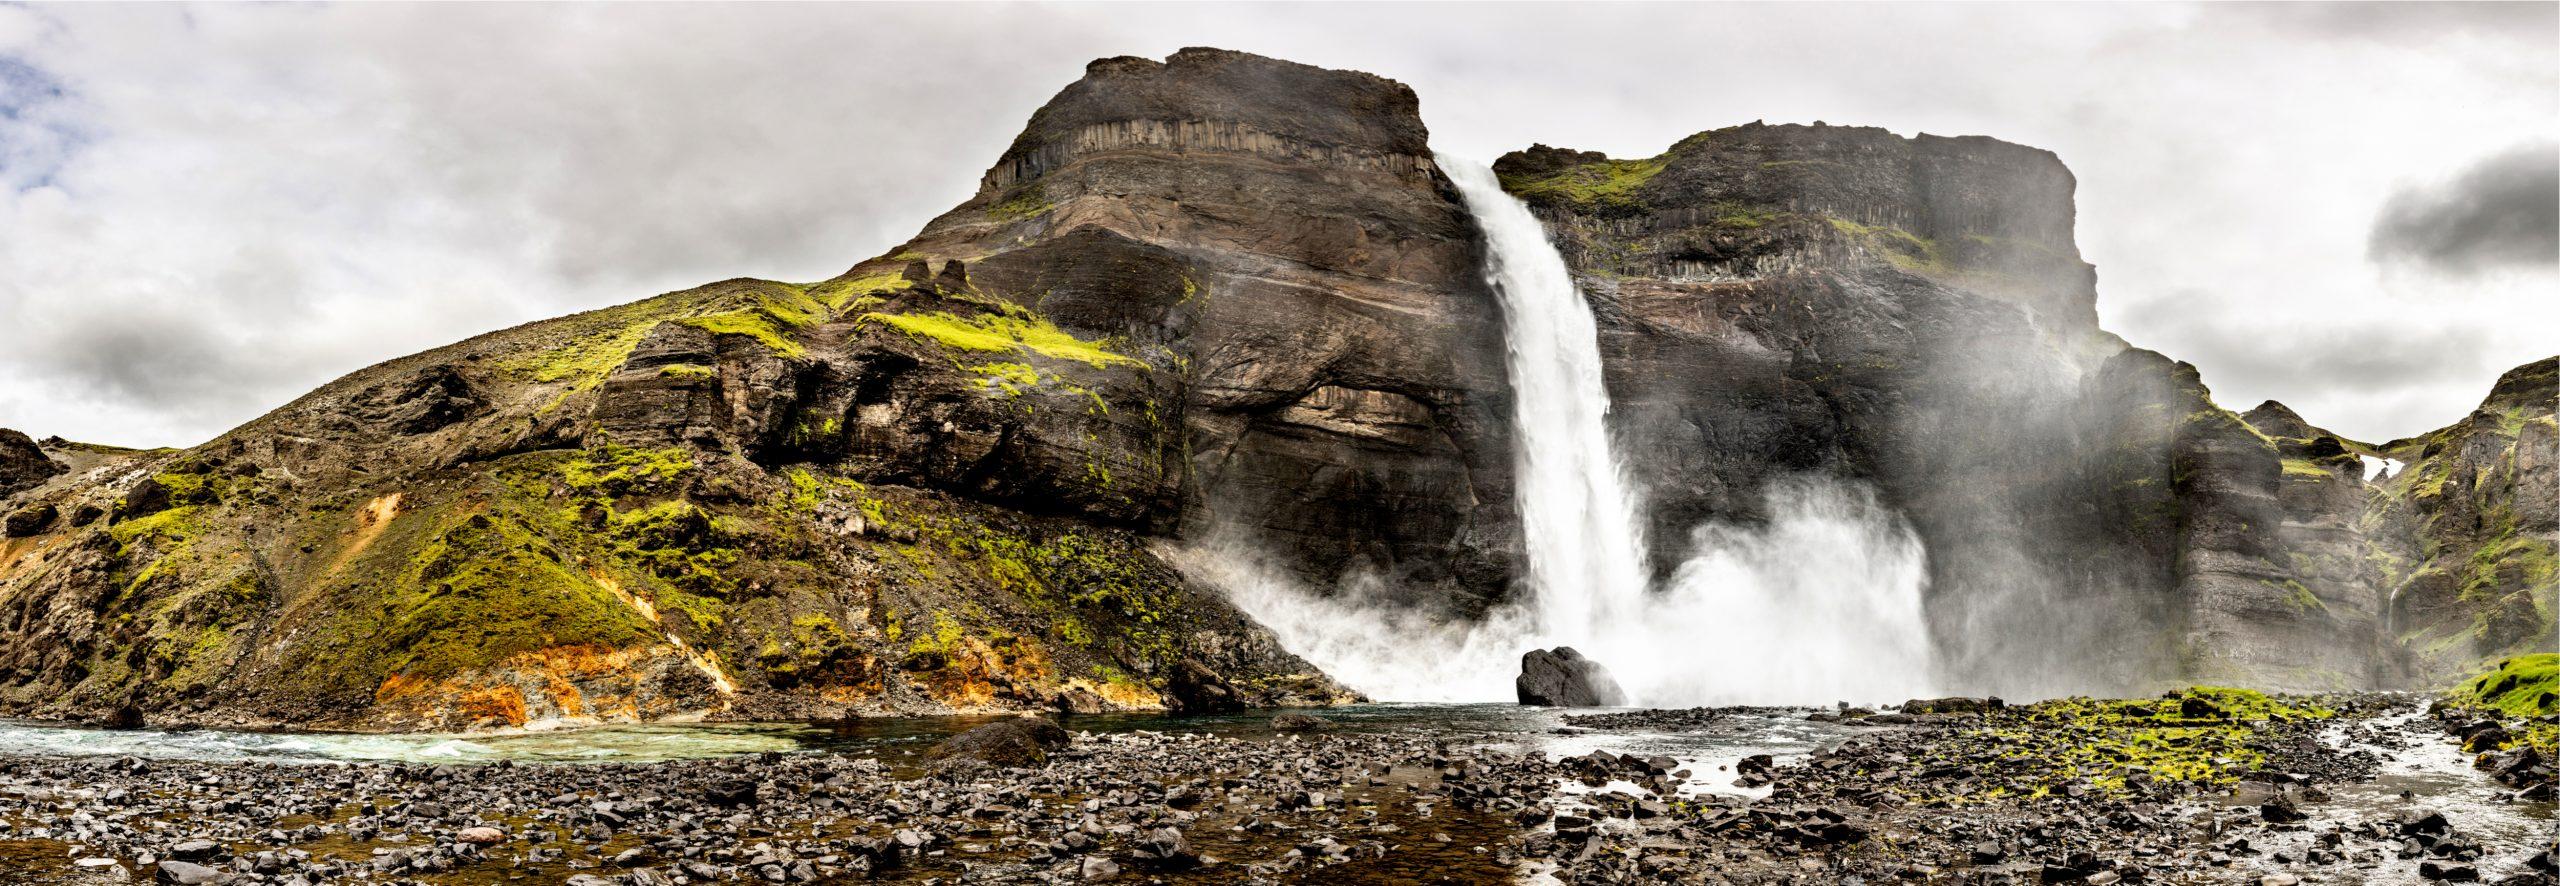 Vista panorámica de Háifoss - La cascada más alta de Islandia